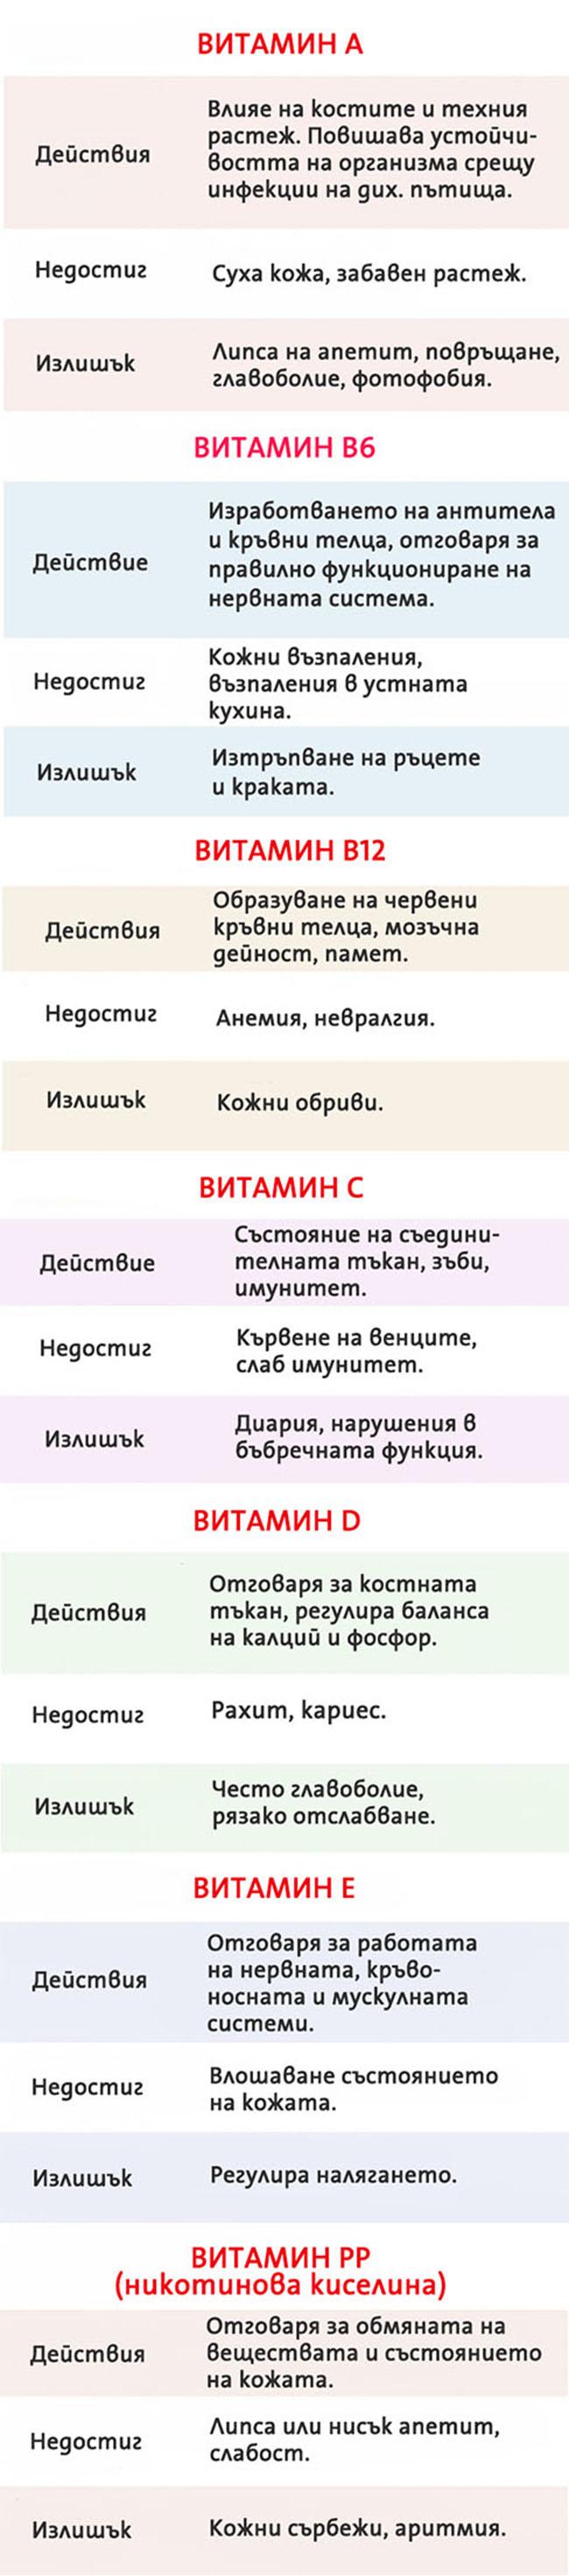 all-vitamins-nsp